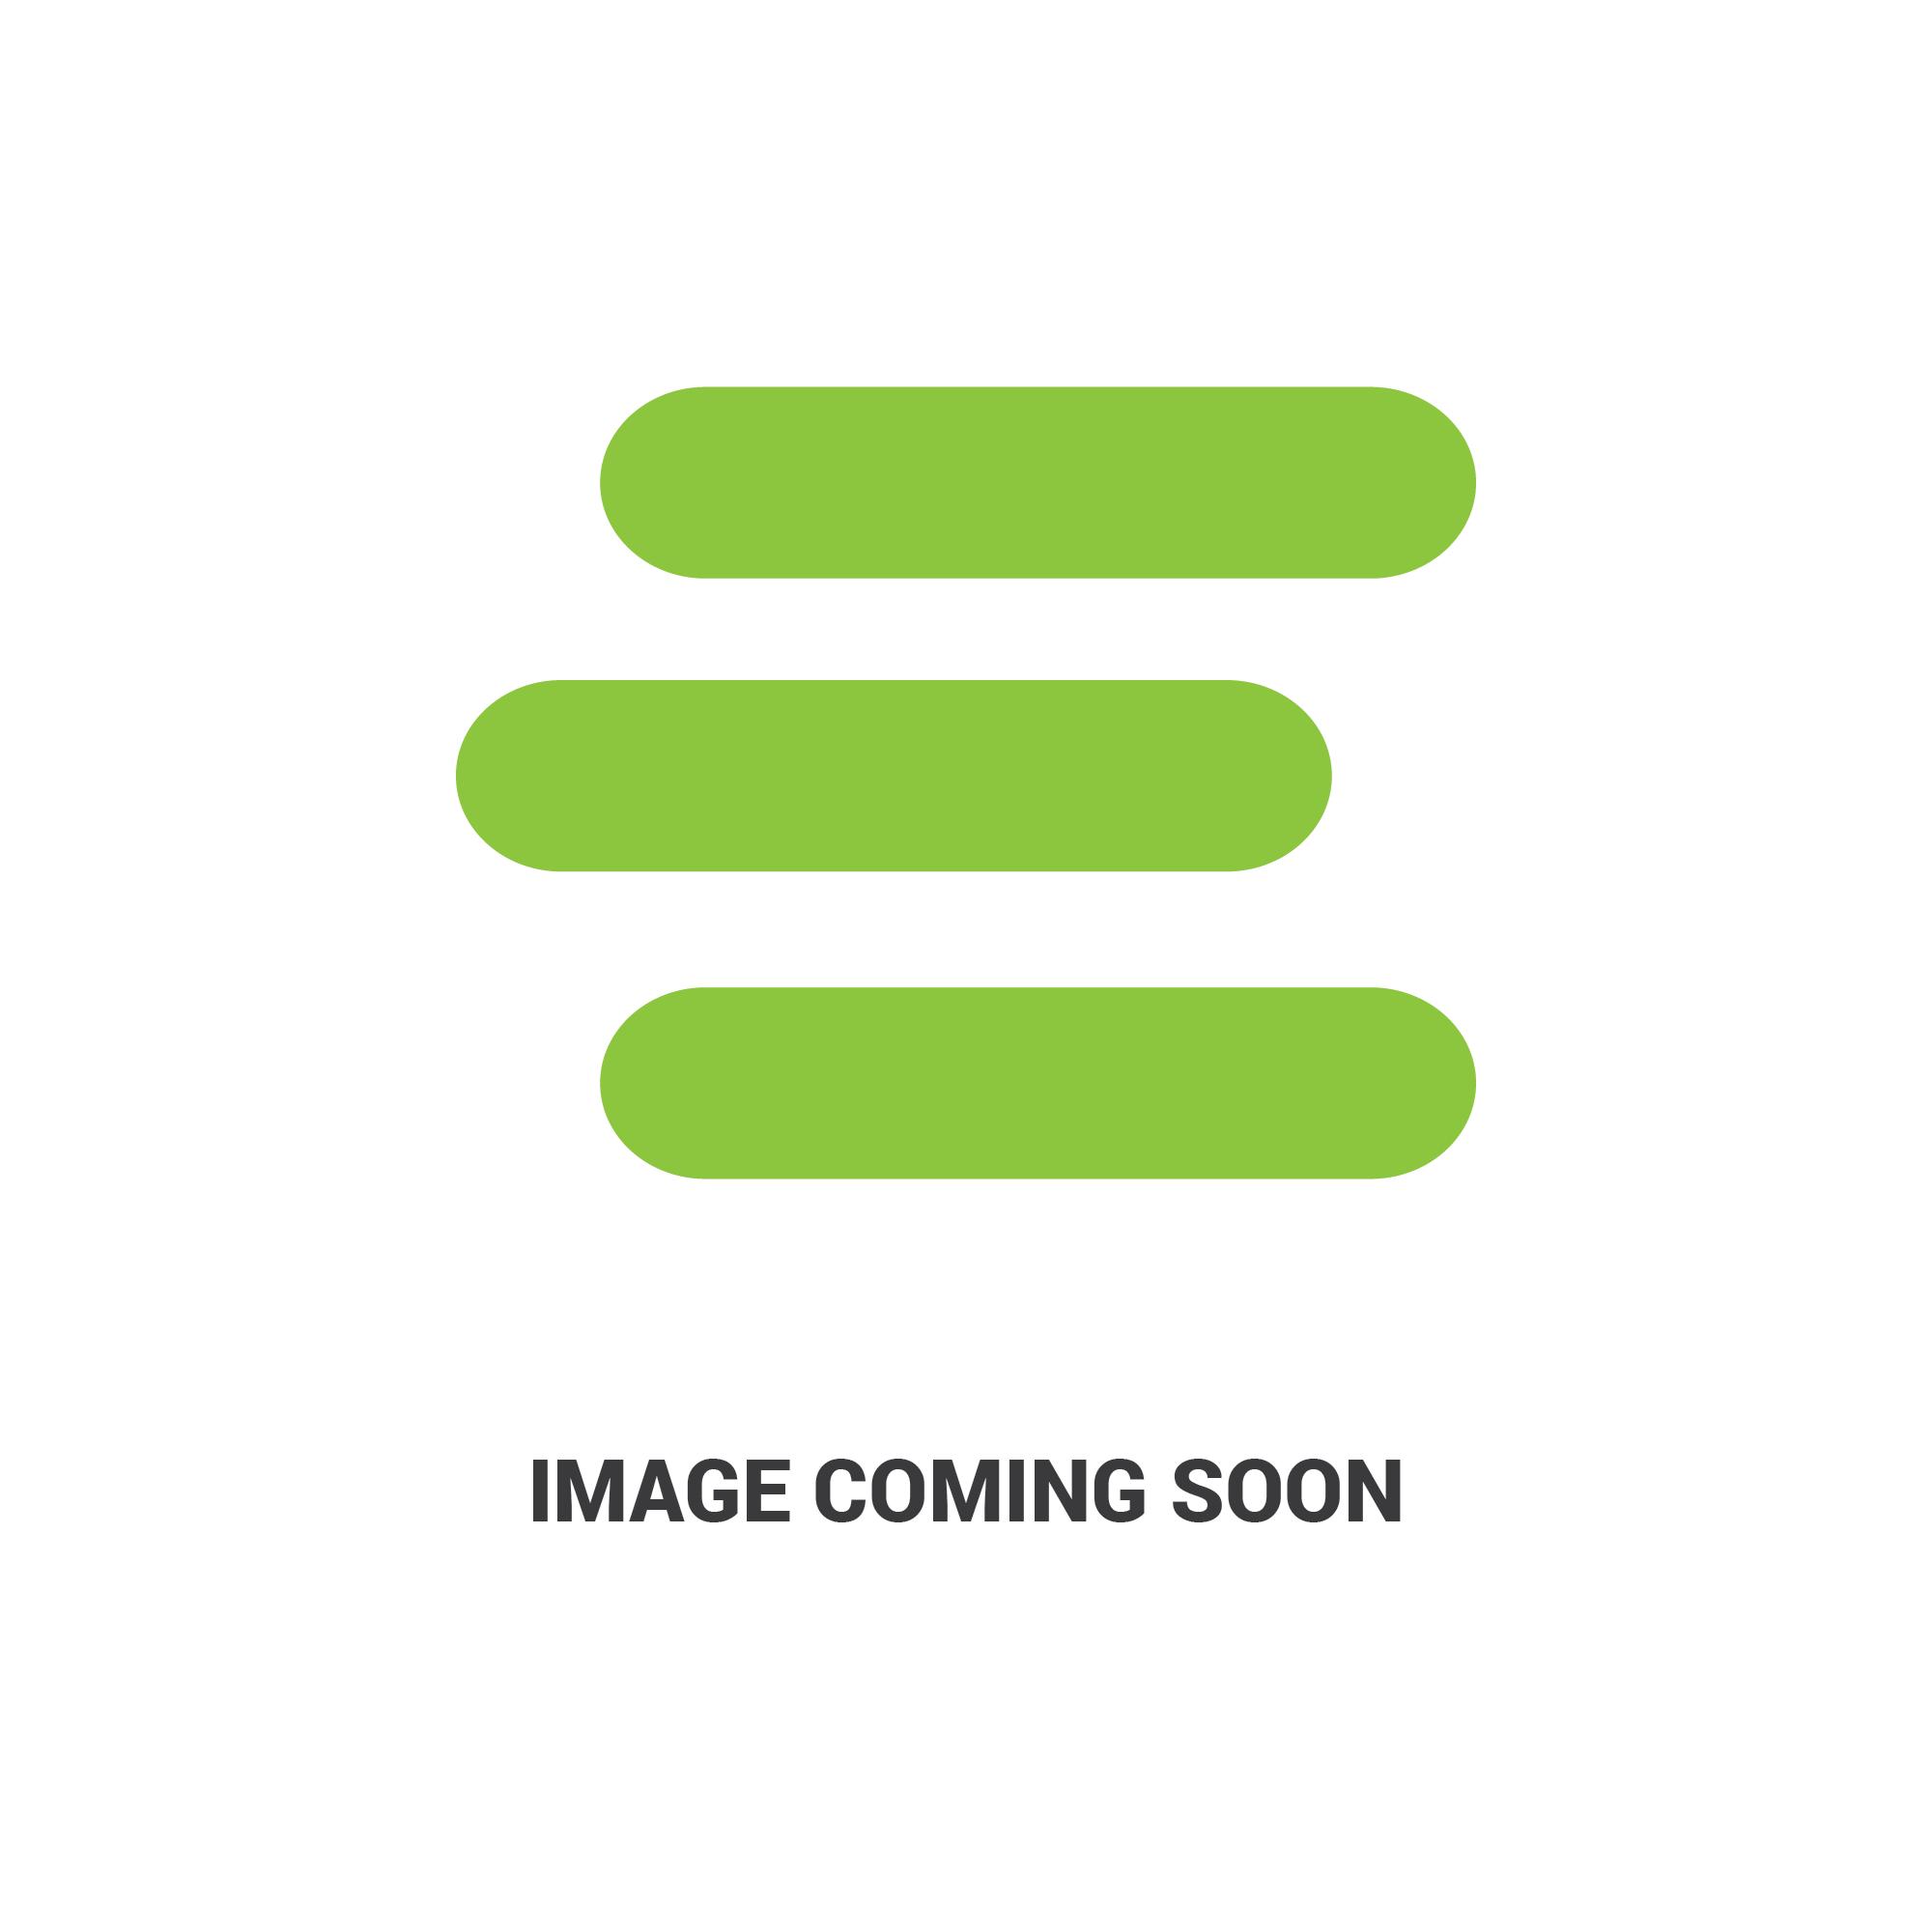 E-6683004edit 1.jpg